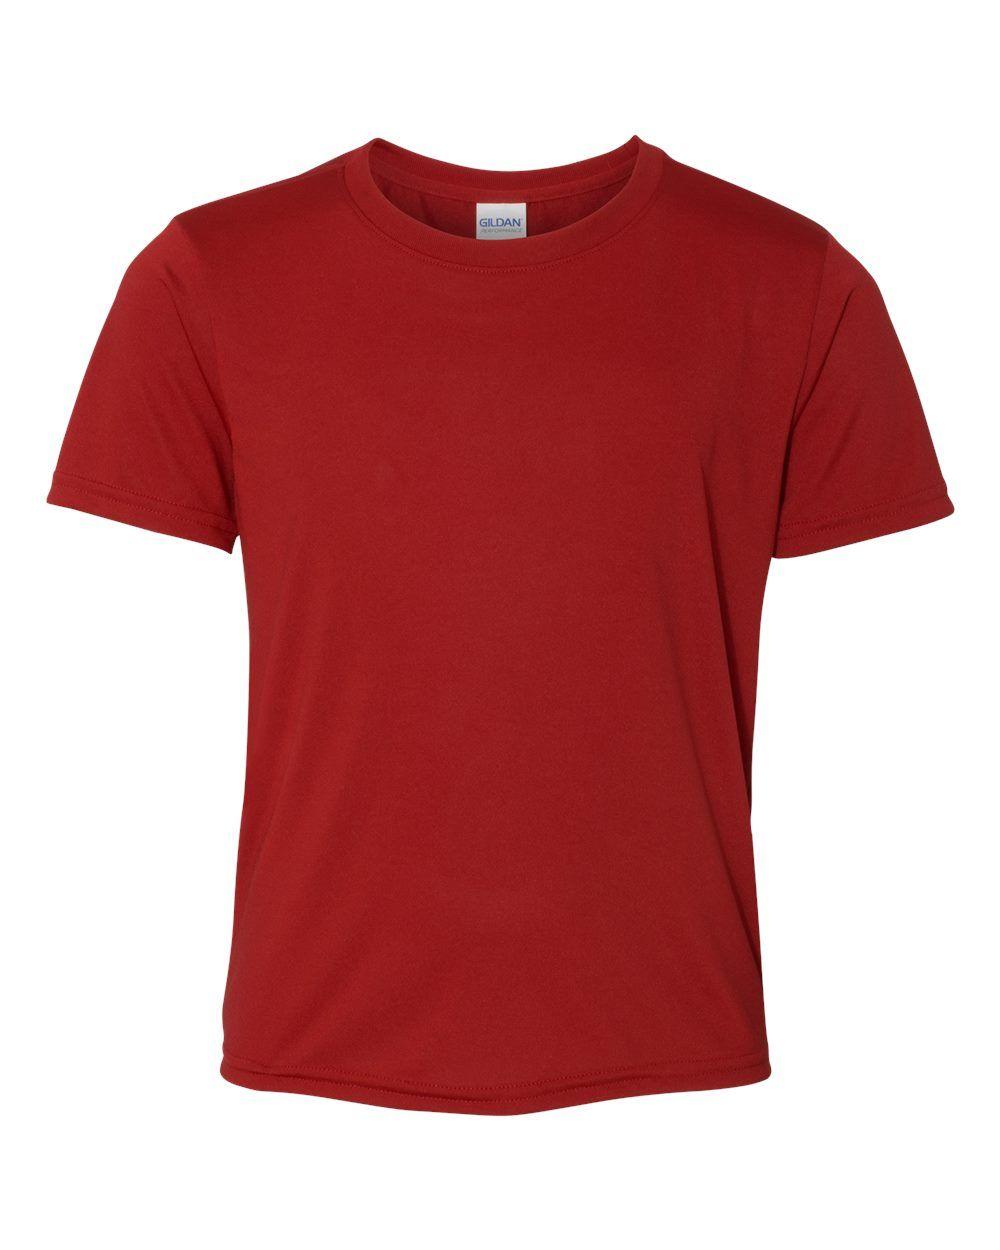 Gildan - Performance® Youth Core T-Shirt - 46000B